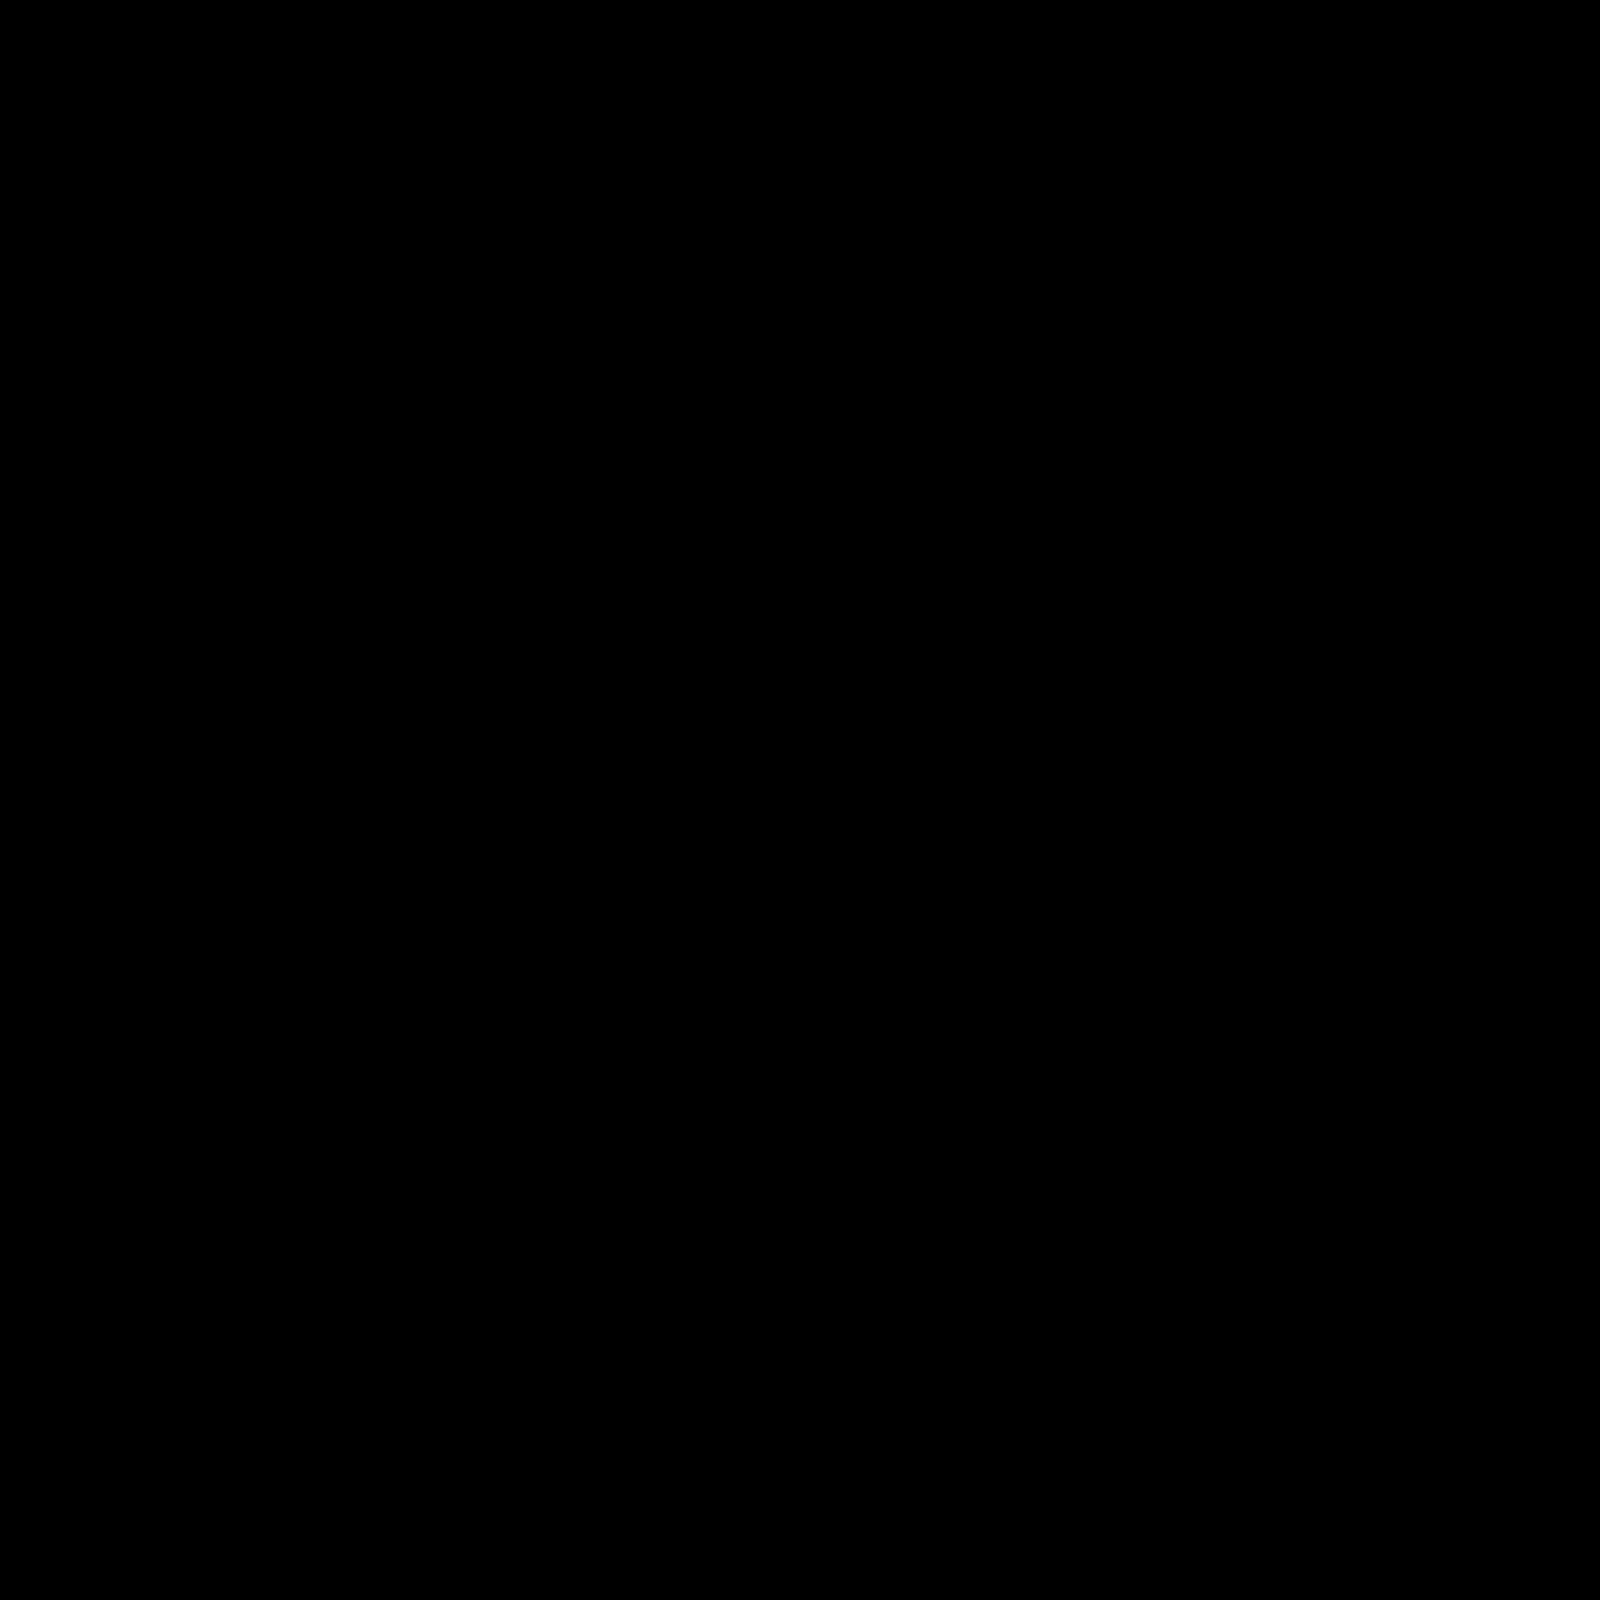 Vk.com icon